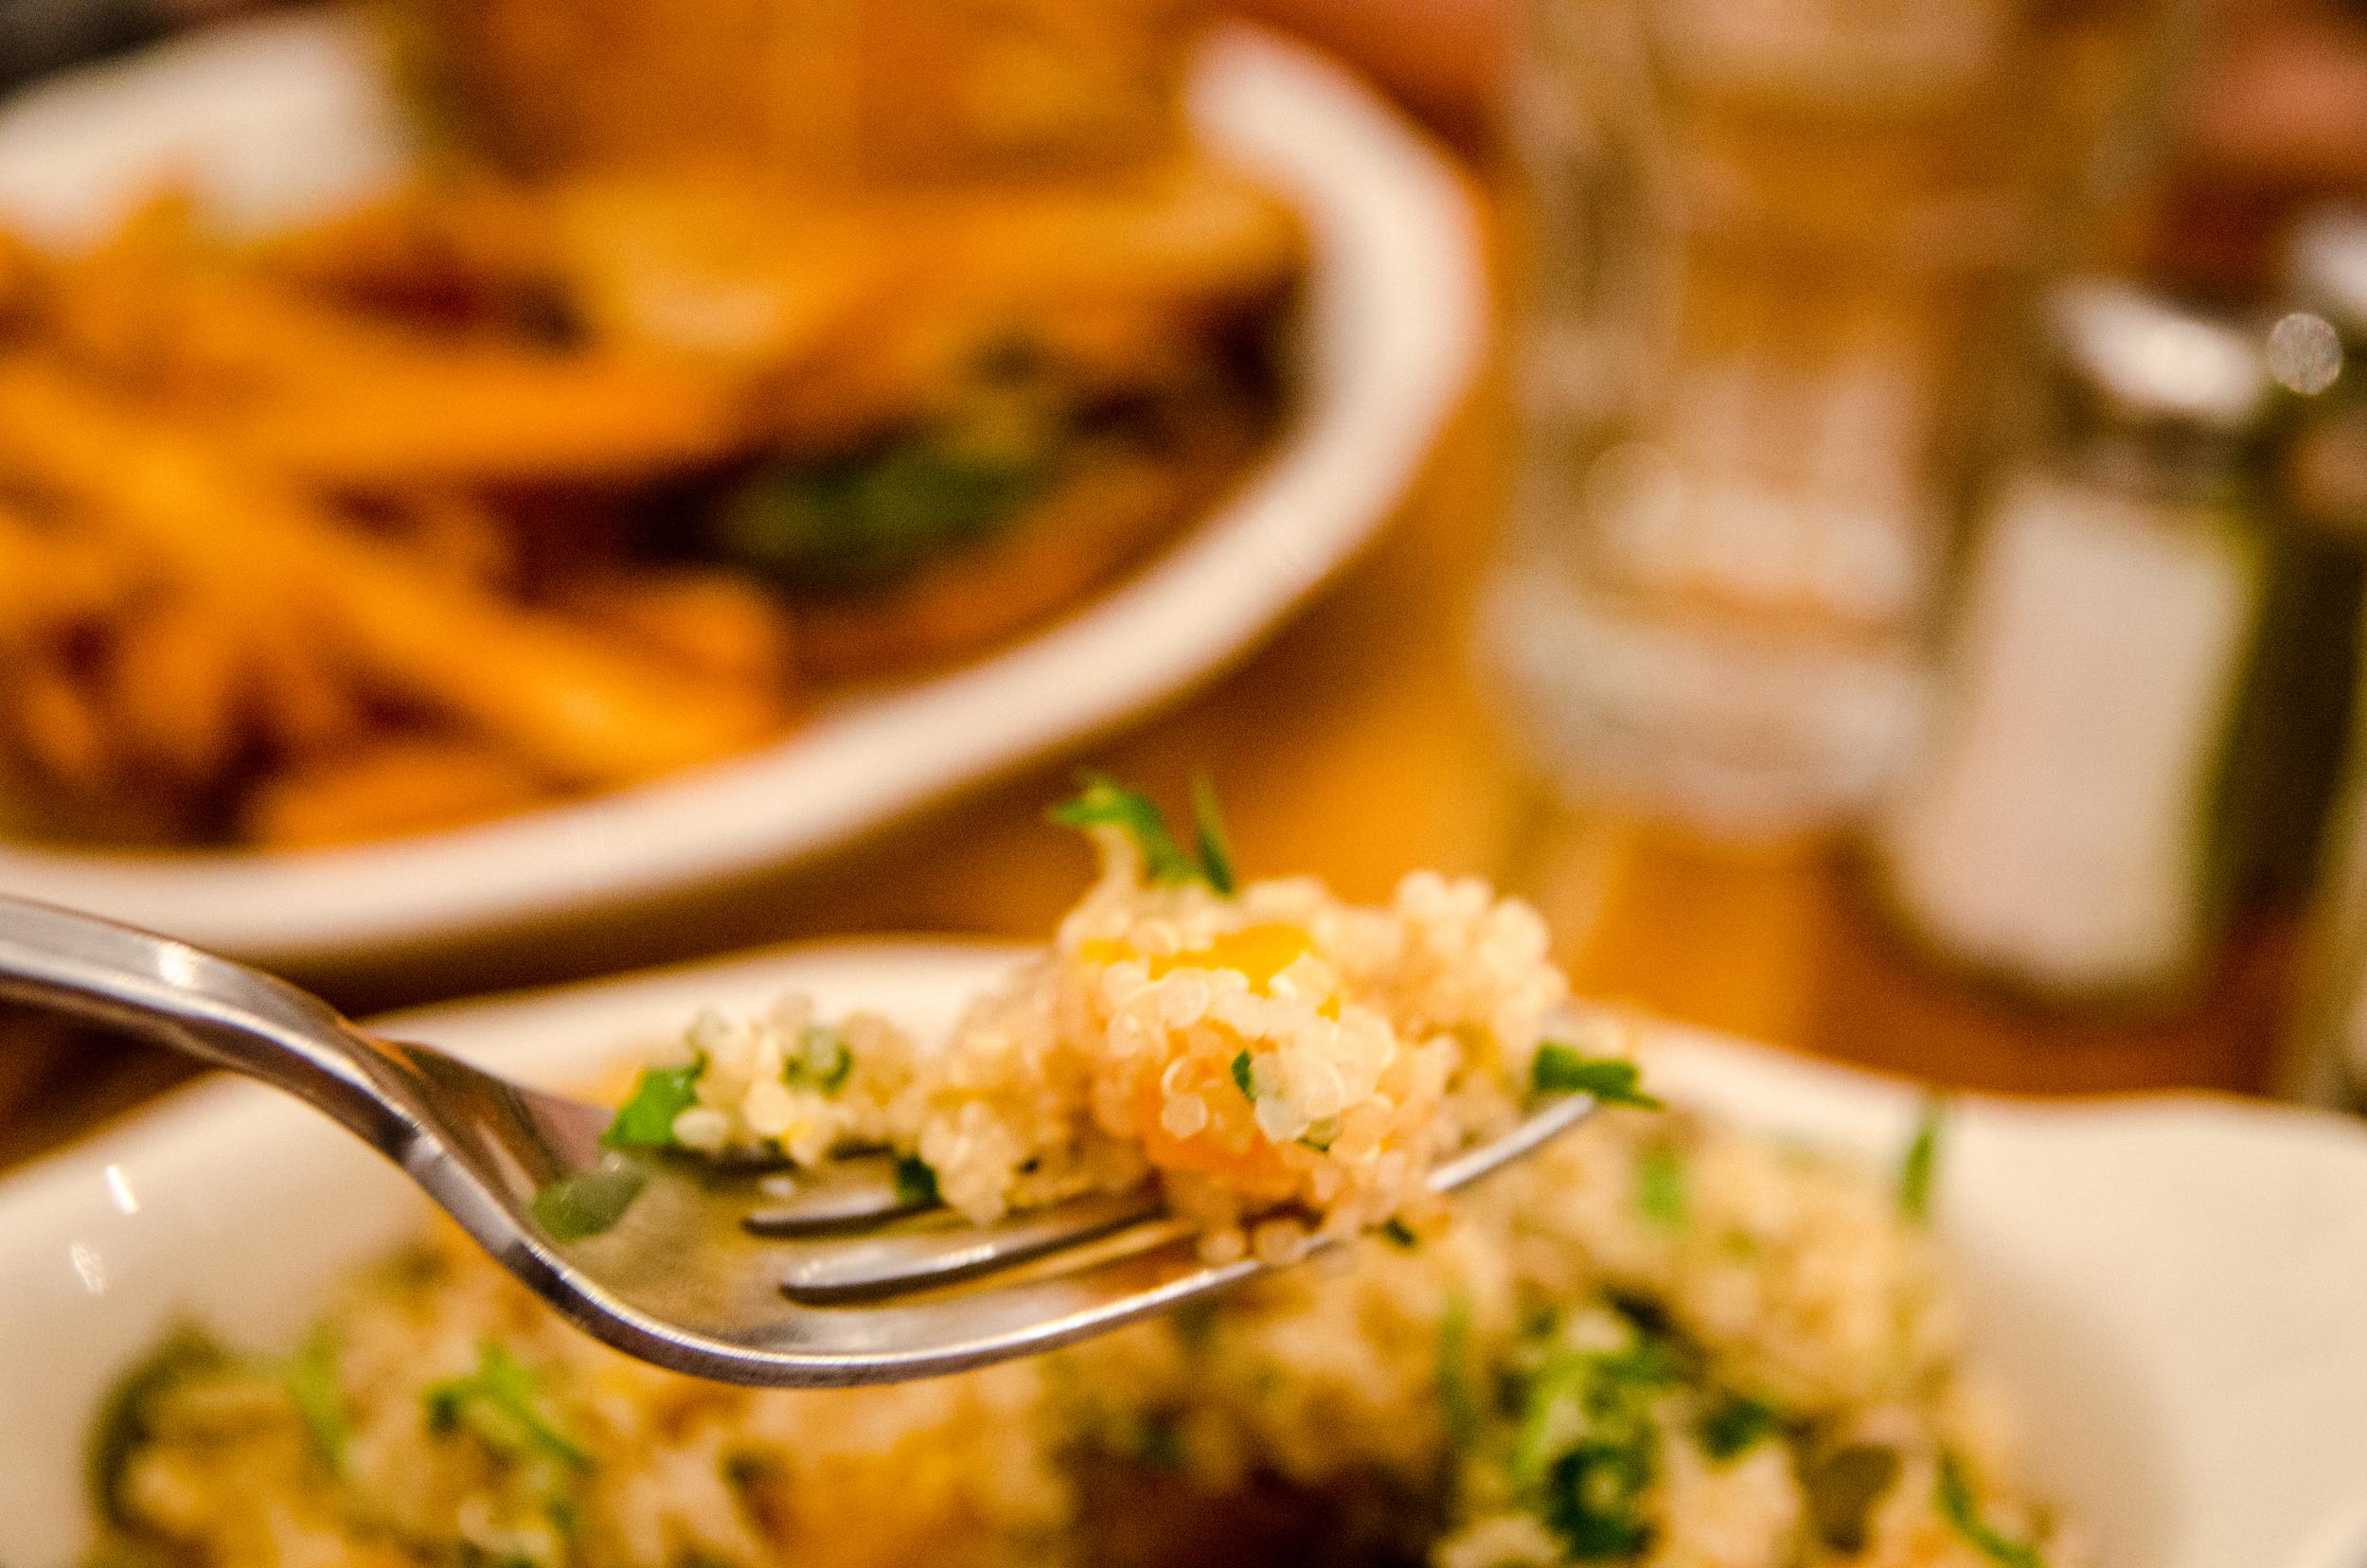 westville quinoa fork .jpg